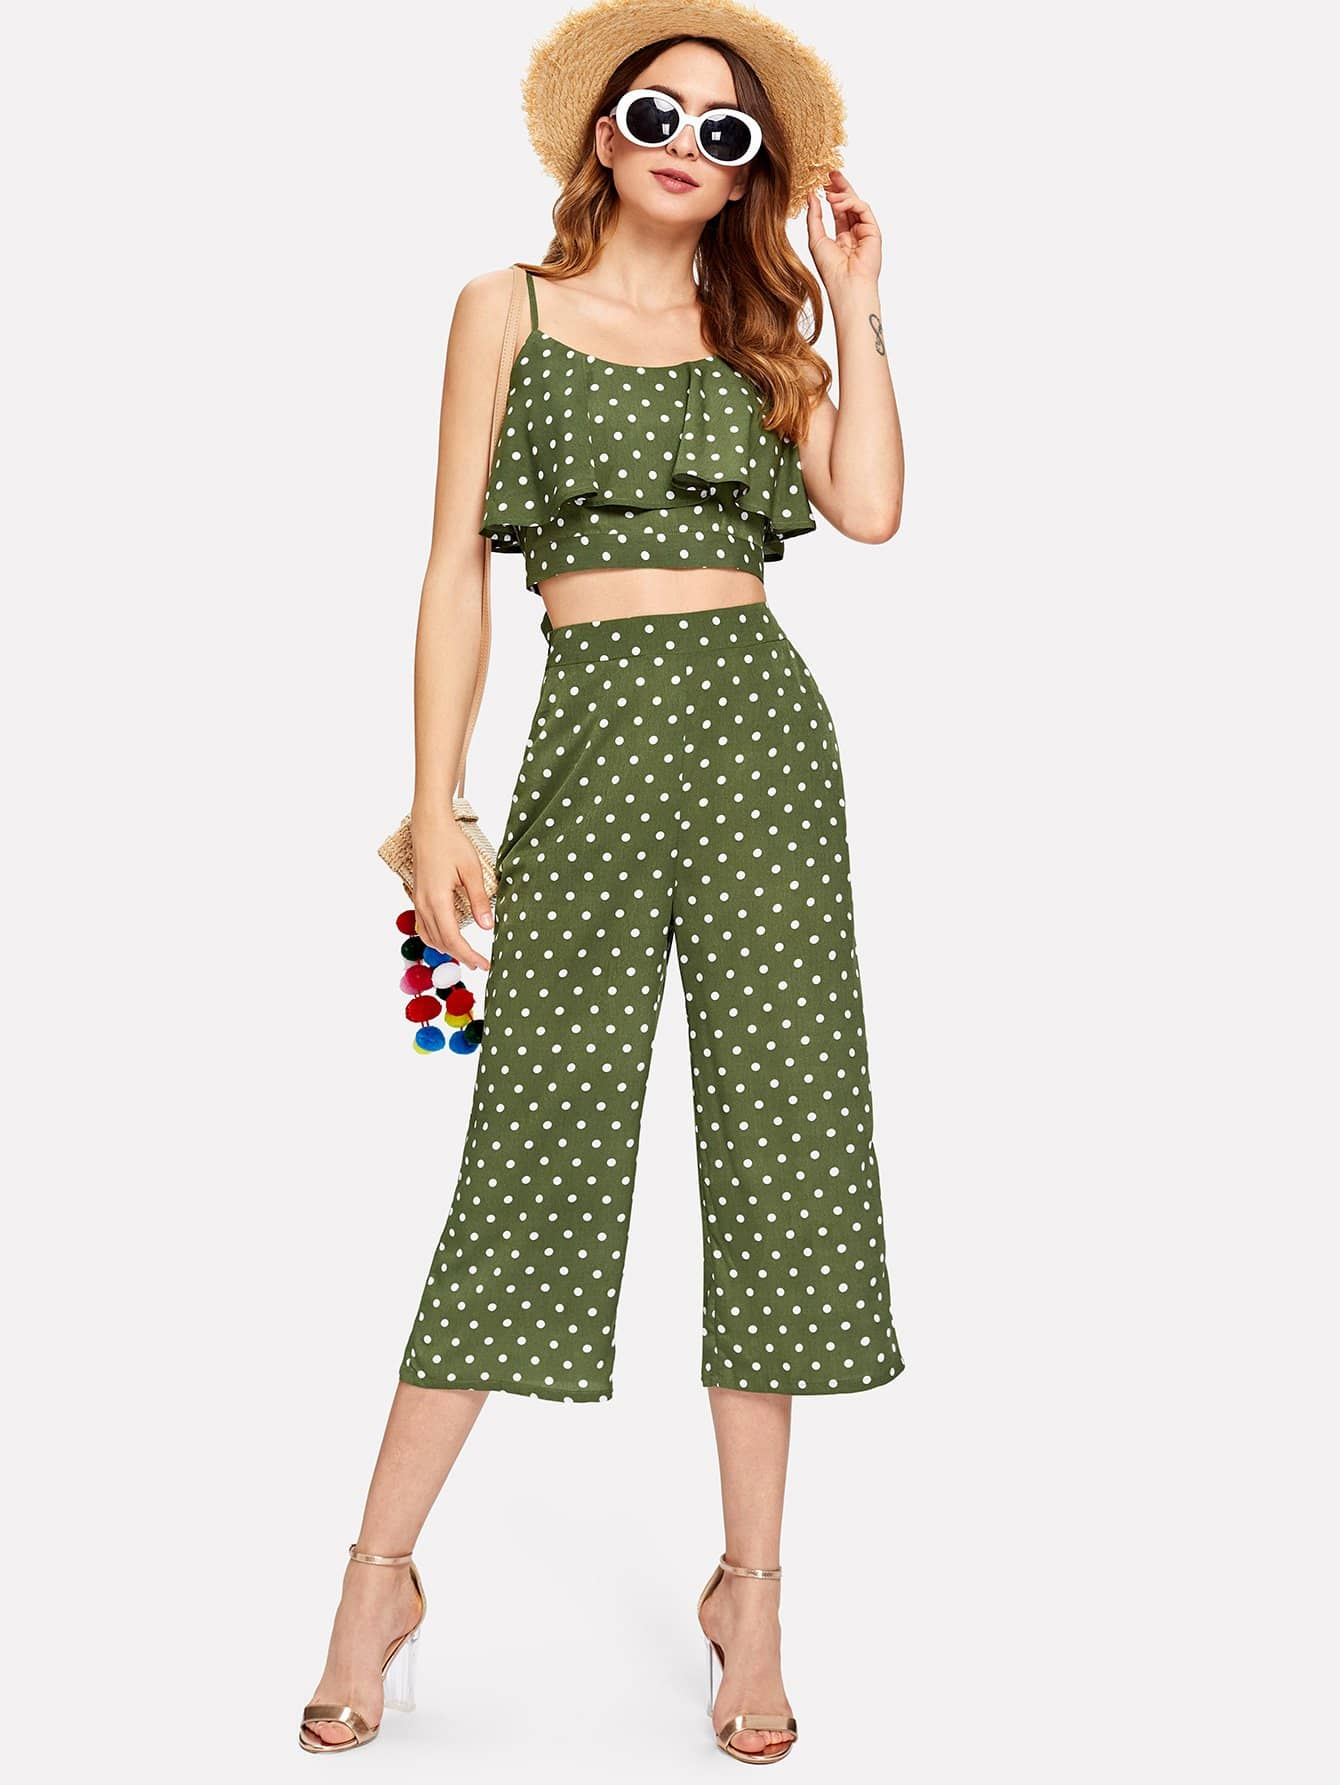 Polka Dot Flounce Cami Top & Culotte Pants Co-Ord polka dot wrap cami top